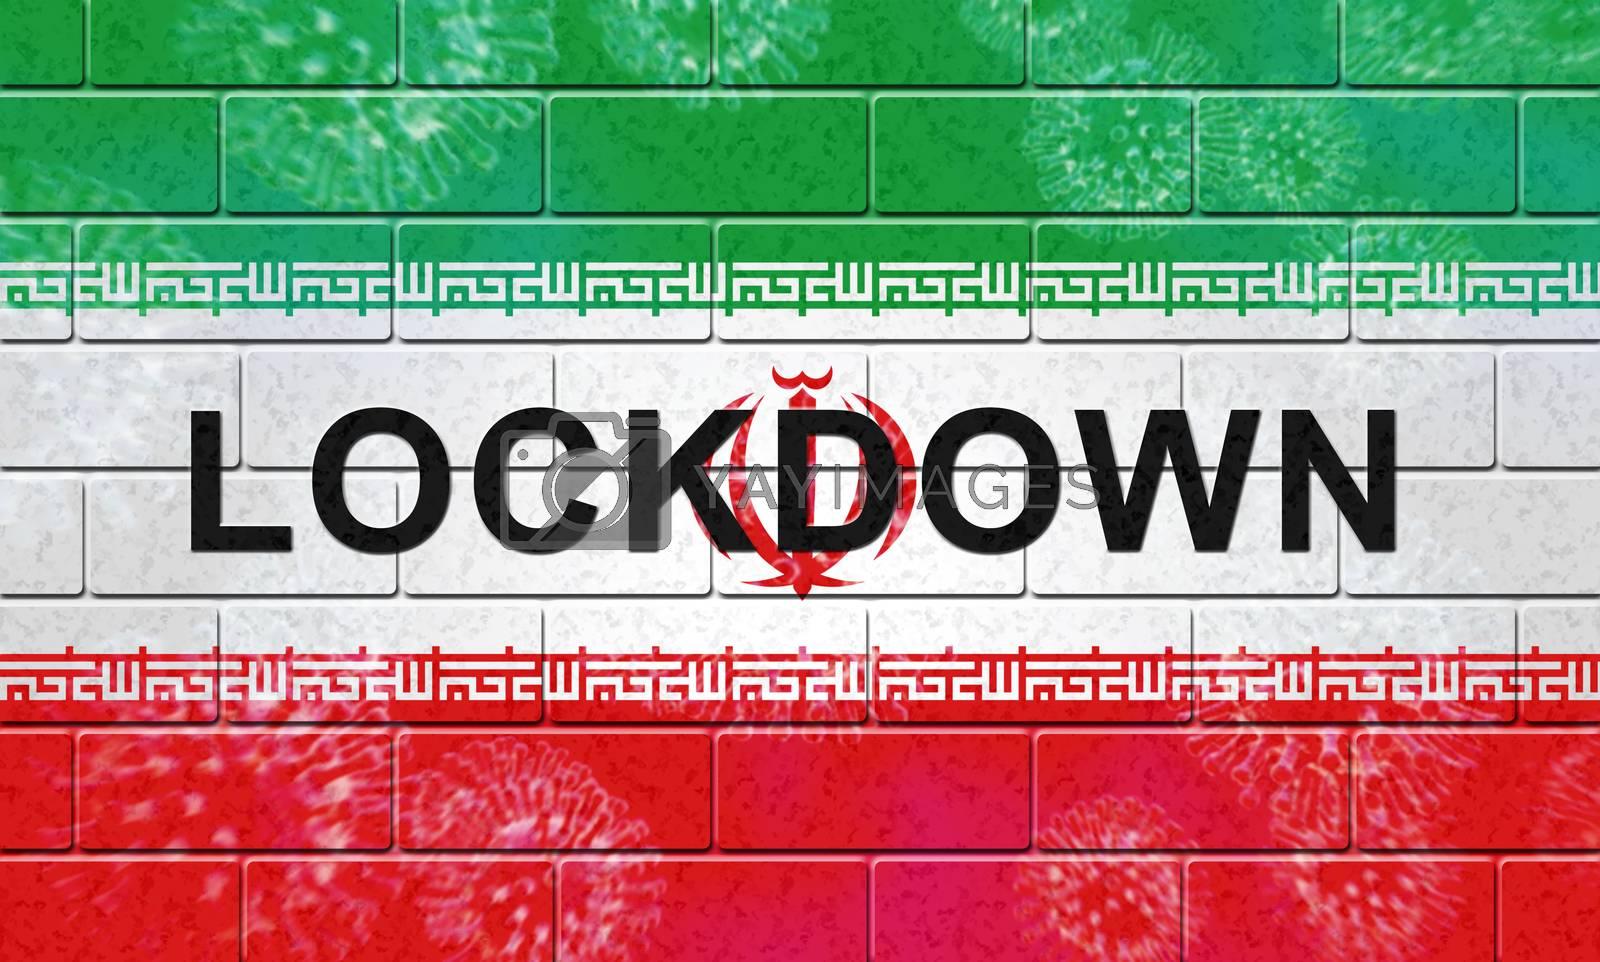 Iran lockdown preventing coronavirus spreading and outbreak - 3d by stuartmiles